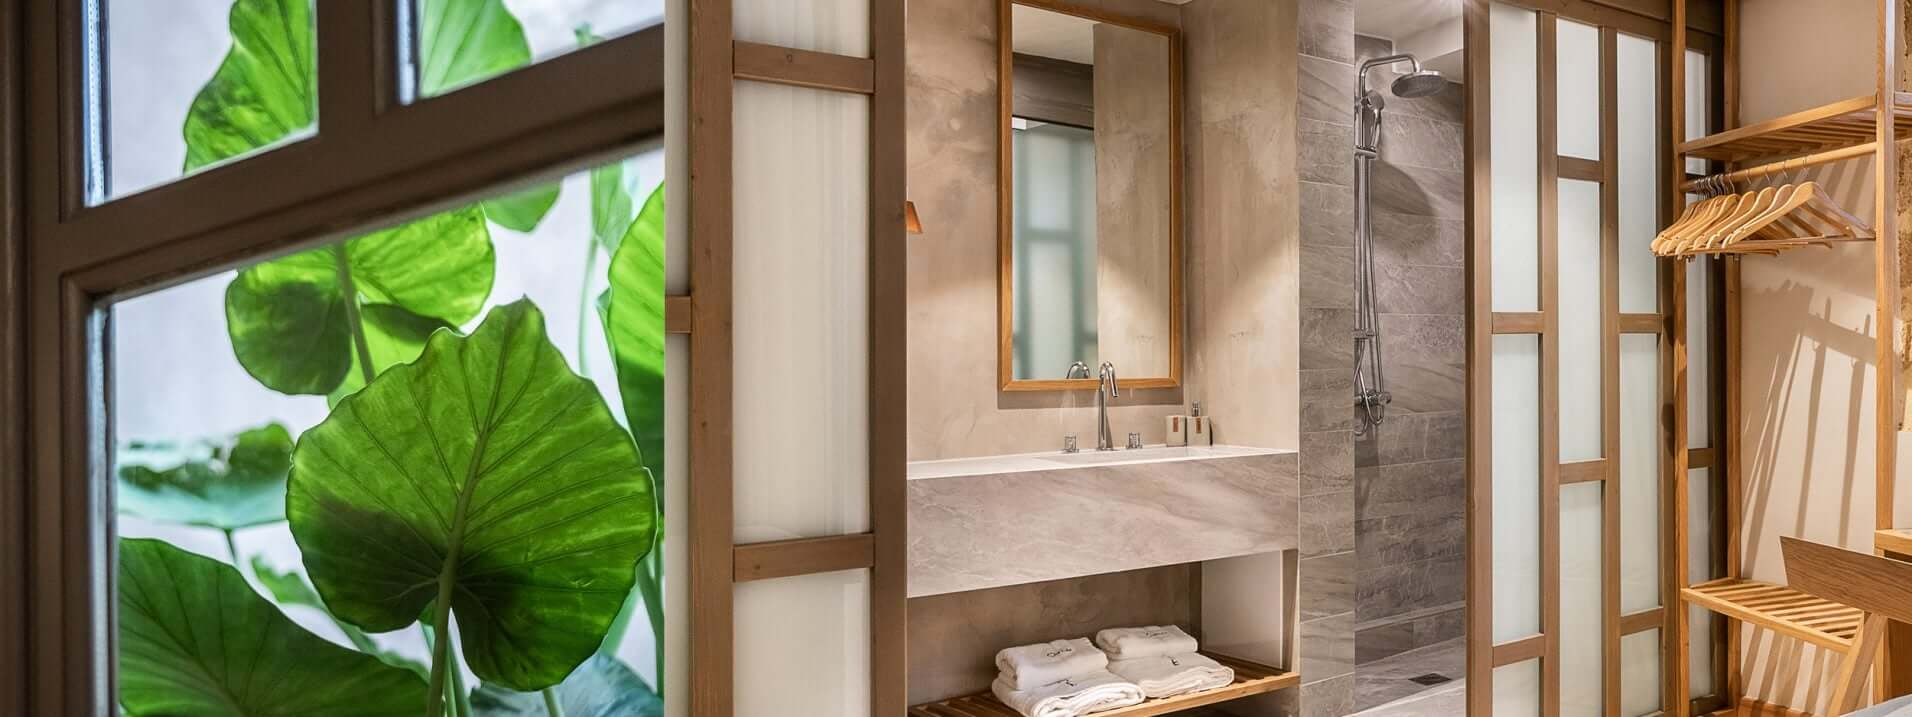 Hotel Off Chania Suite Bath Plant 1912x717